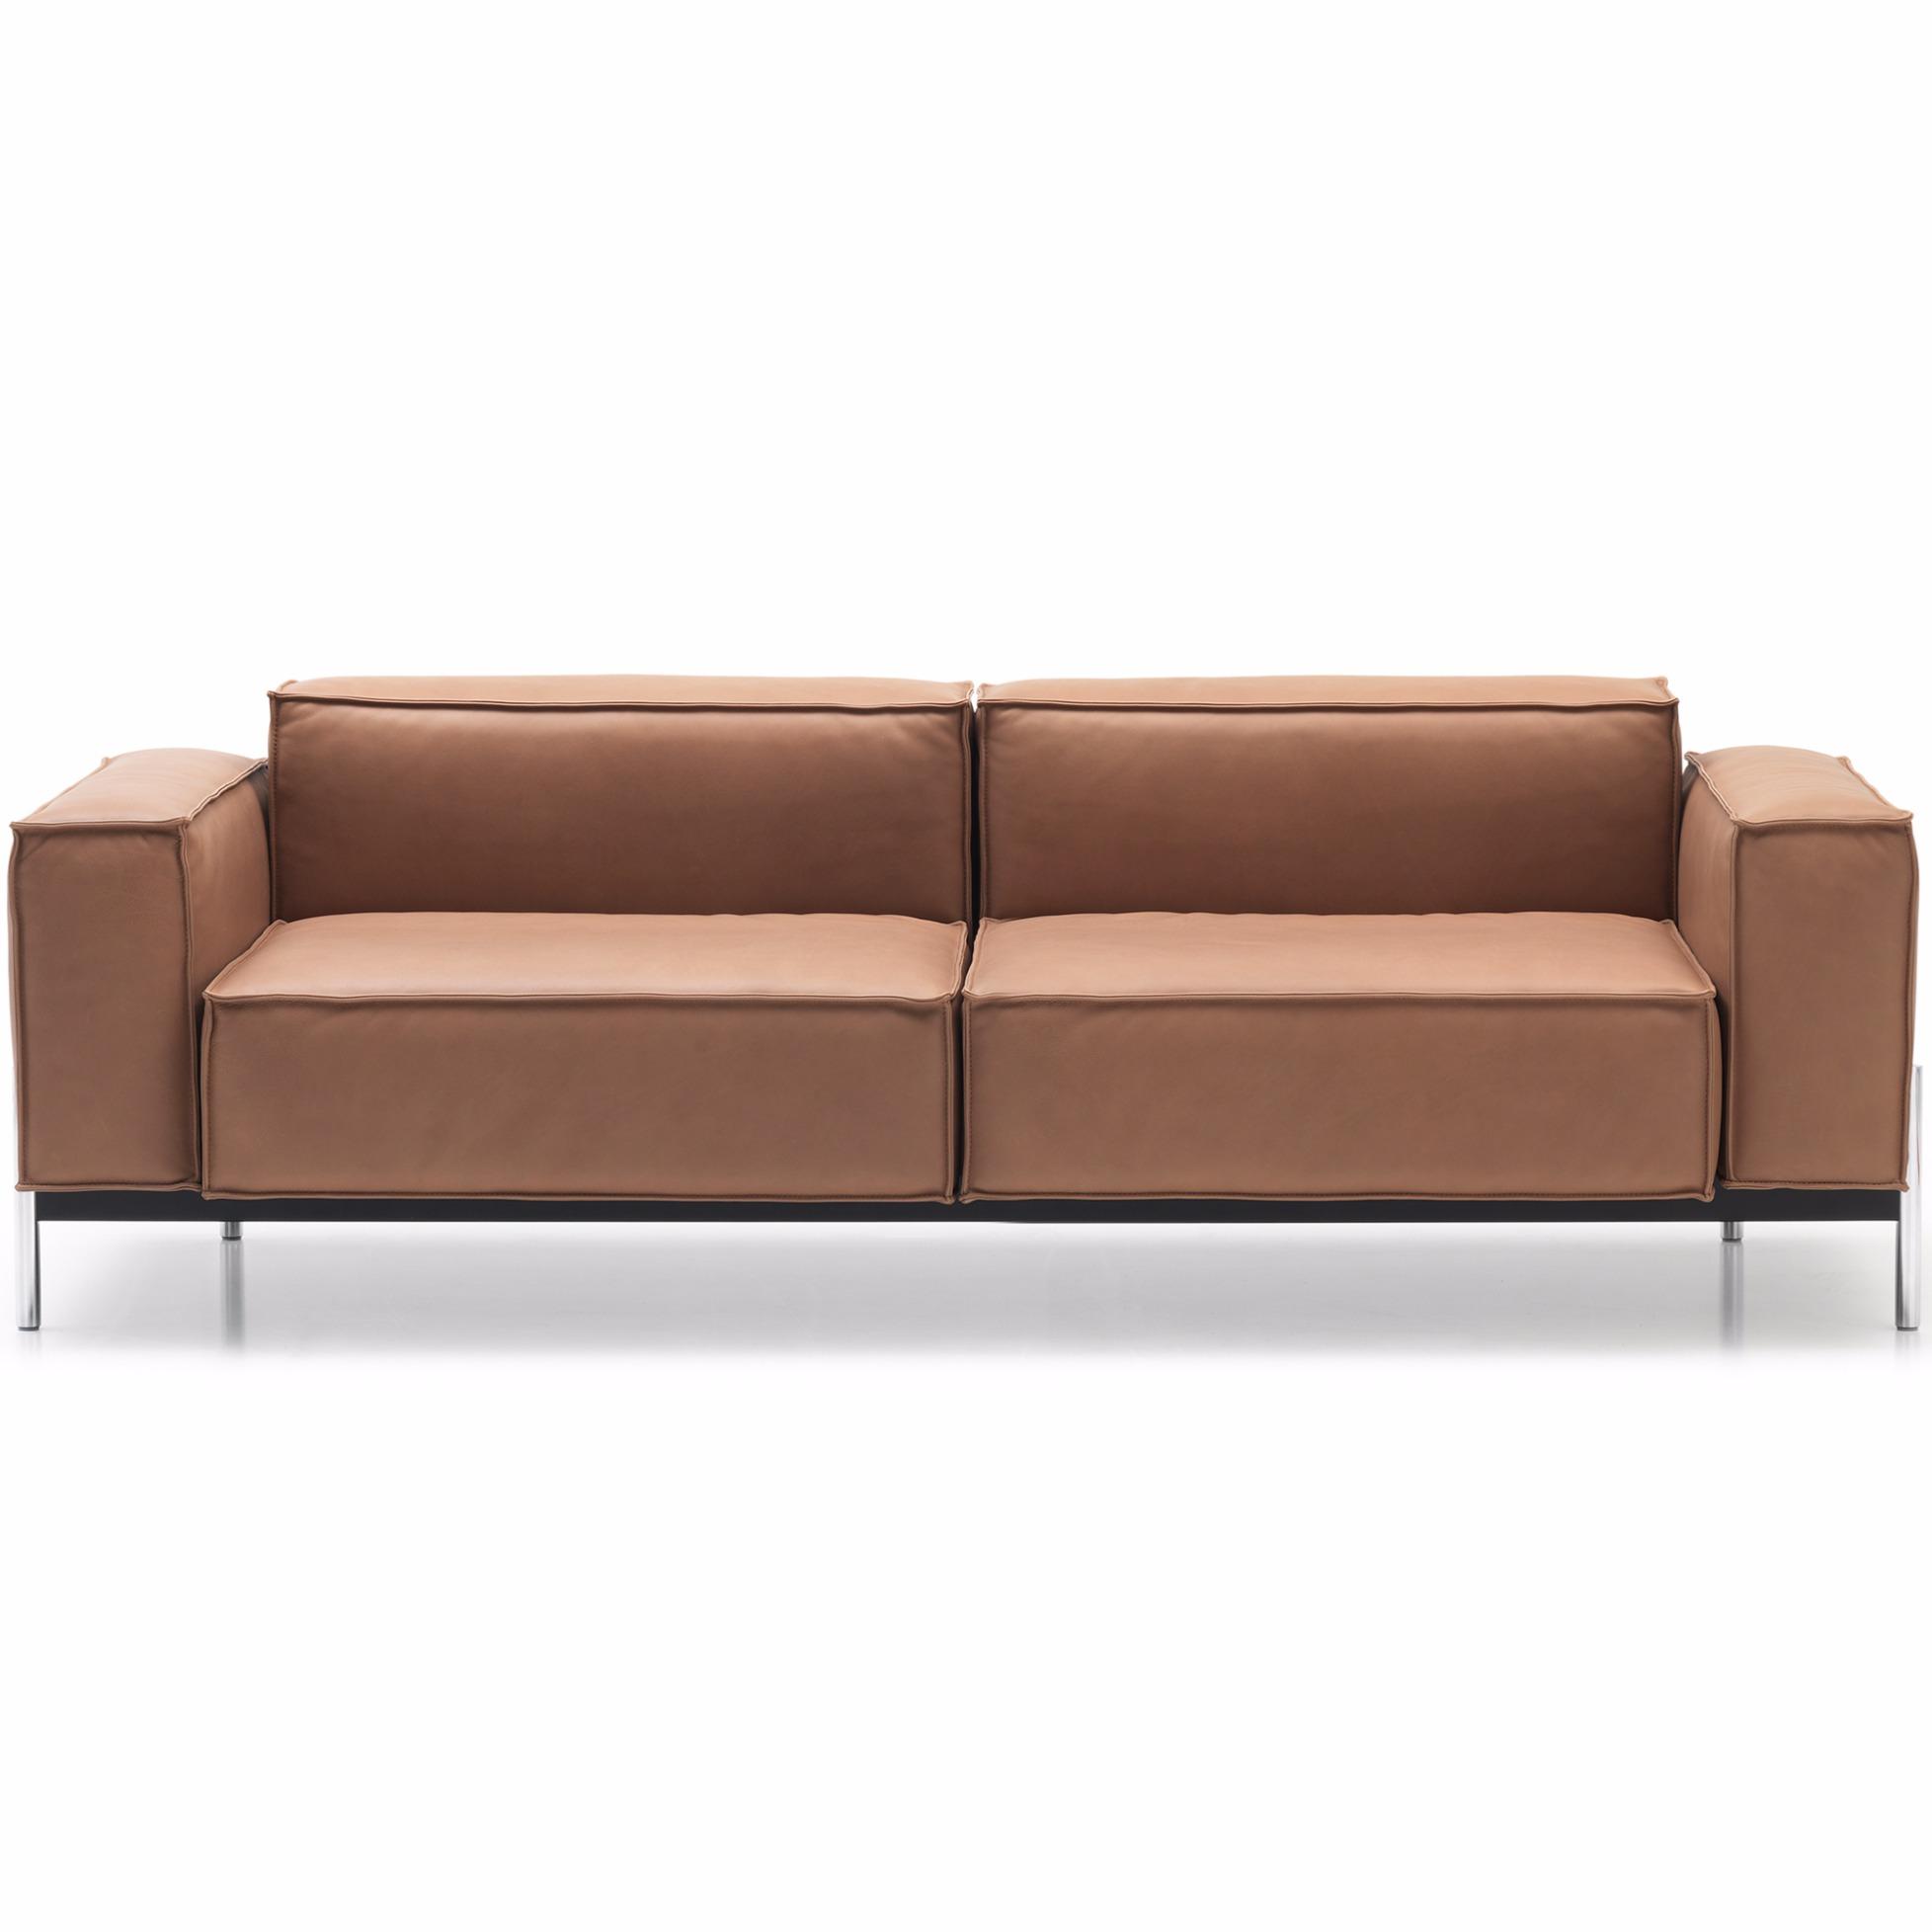 Full Size of De Sede Sessel Preise Furniture Usa Sofa Preisliste Gebraucht Schweiz Uk For Sale Preis Couch Sleeper Used Kaufen Ds 21 23 Von Baden Hotel Sri Lanka Rundreise Sofa De Sede Sofa